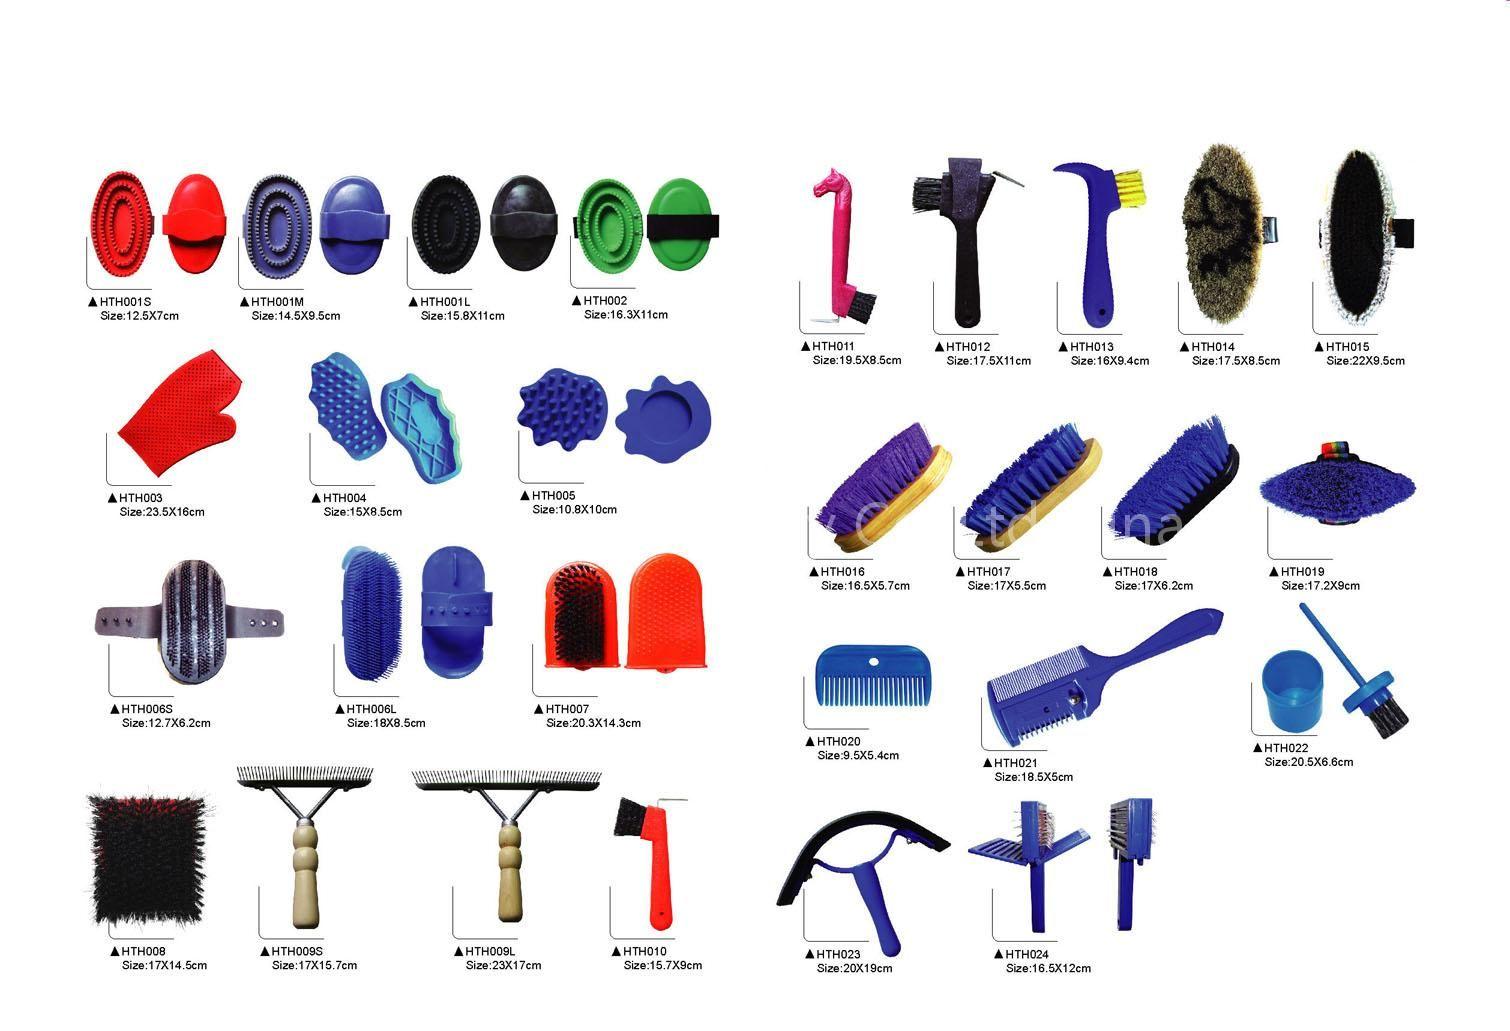 image relating to Grooming Tools for Horses Printable Worksheet named Horse Brushes Diagram Wiring Diagram